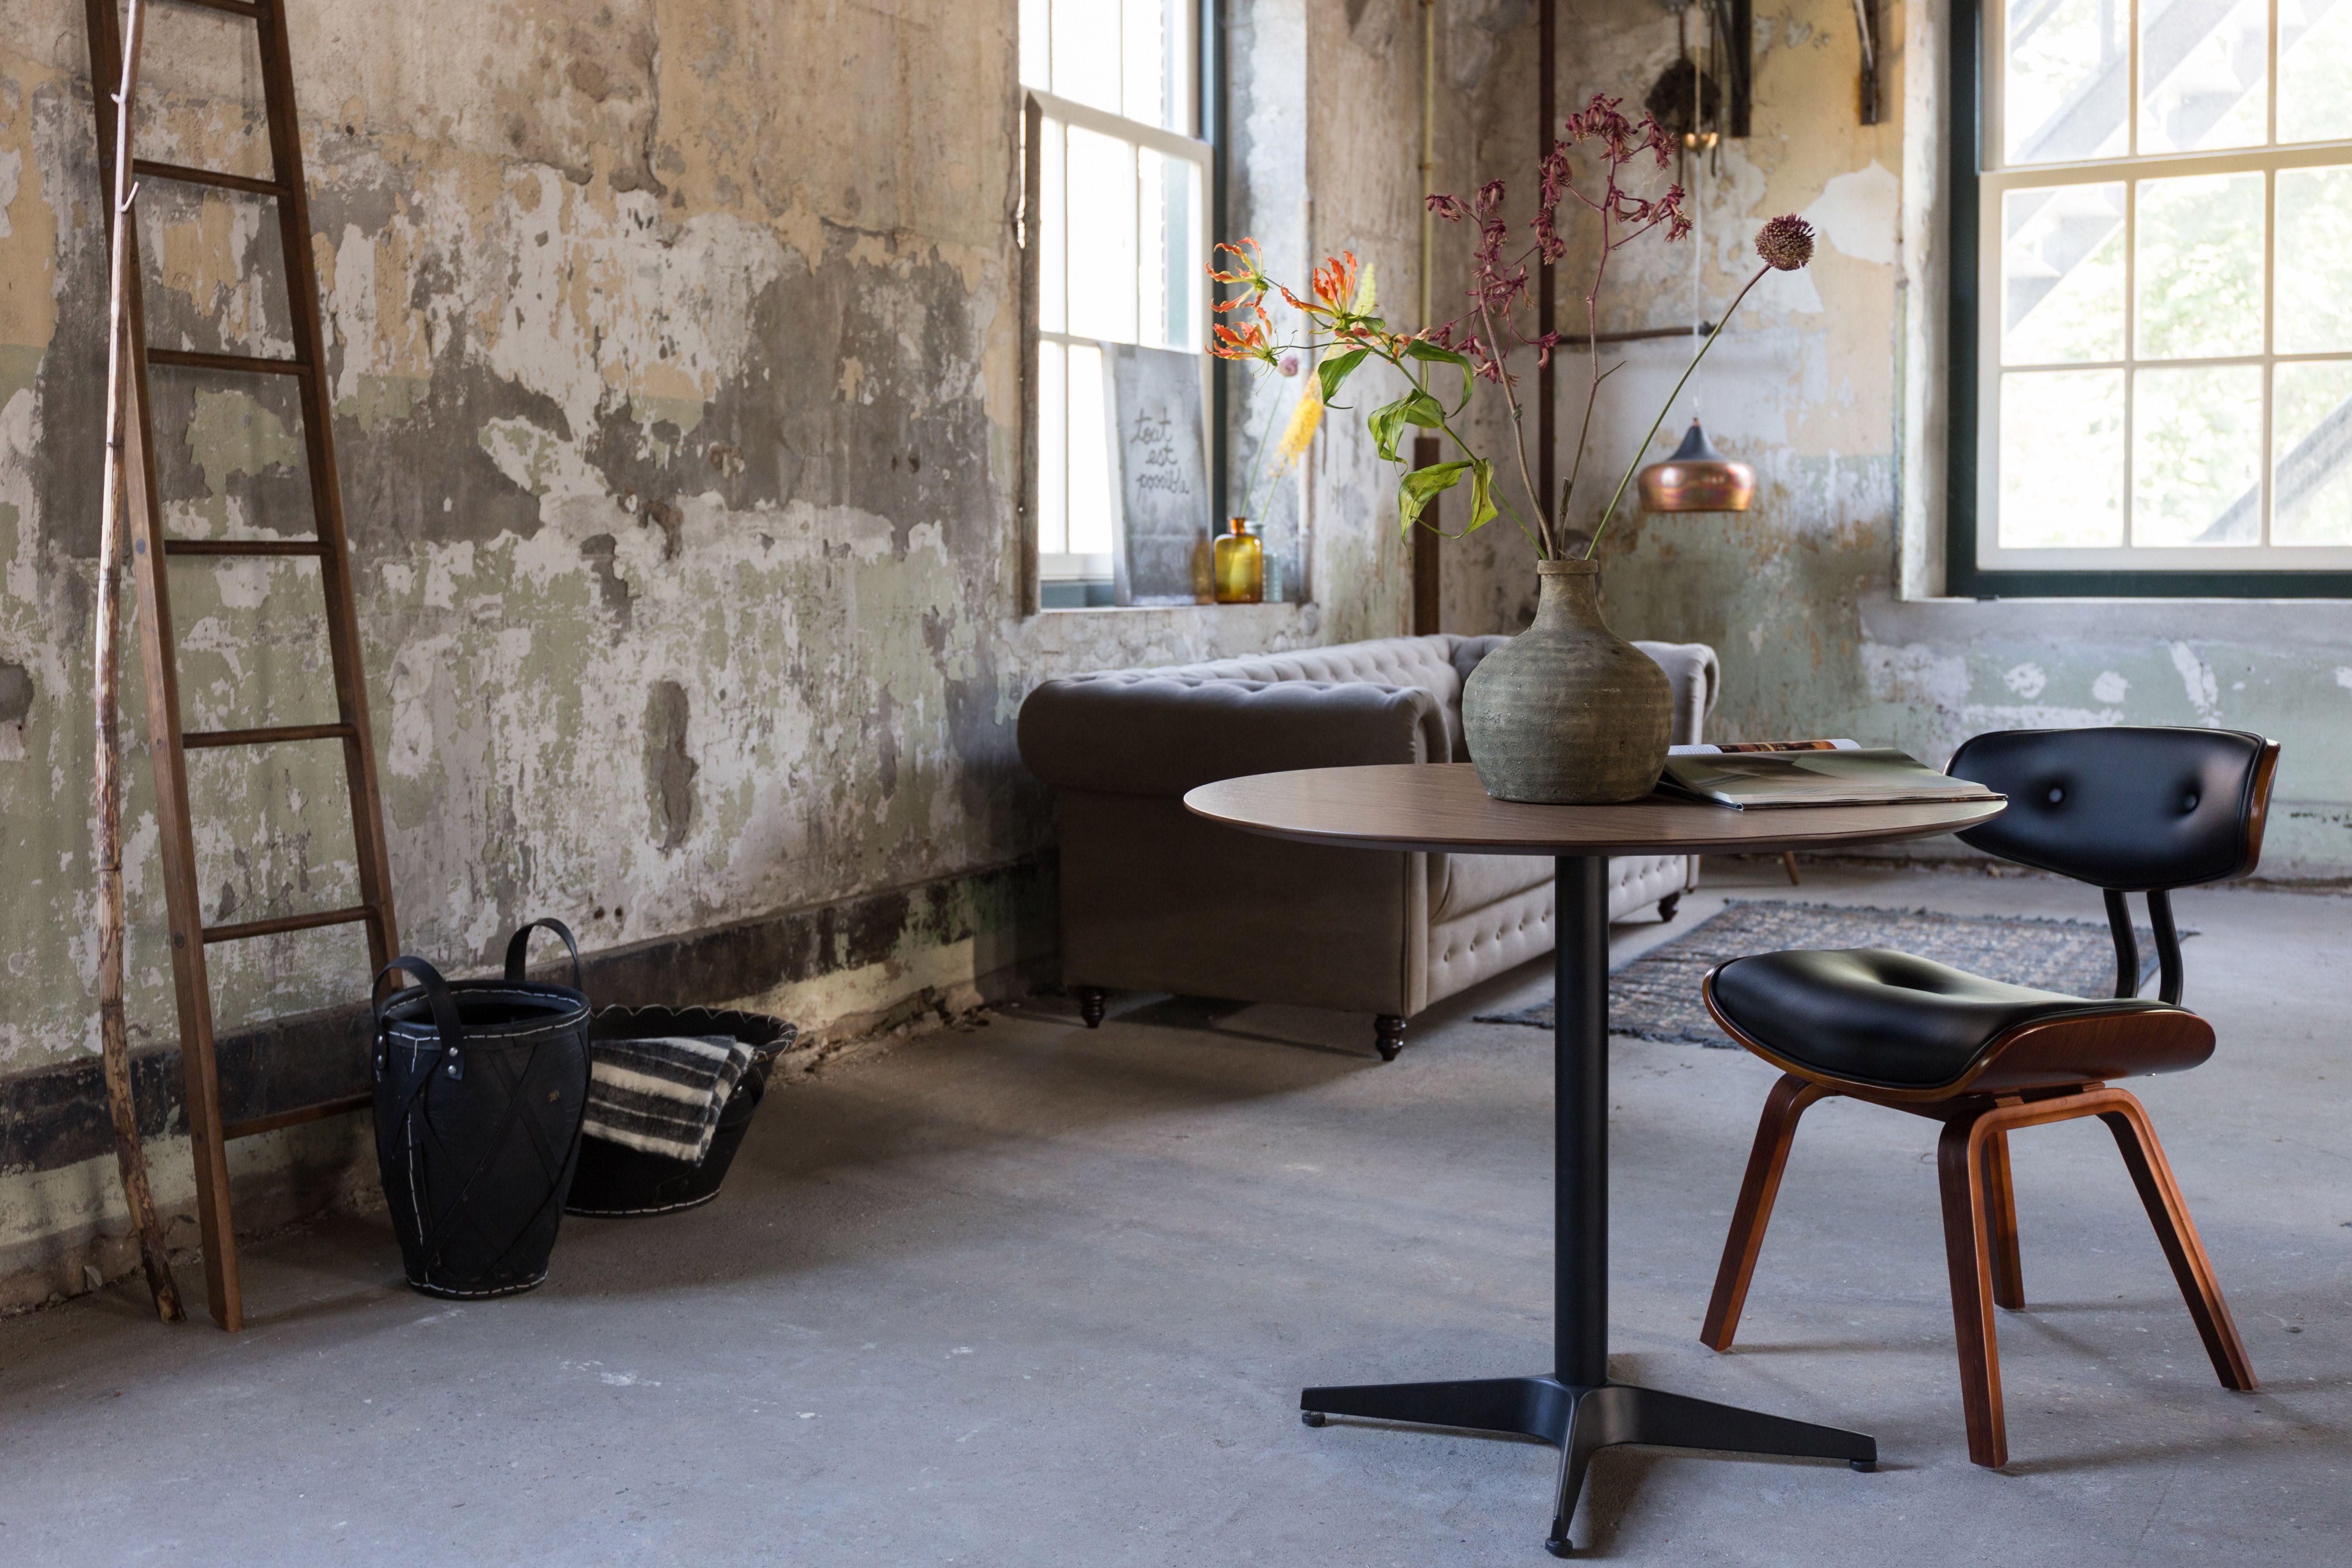 Dutchbone Stoel Blackwood : Chair blackwood dutchbone bij 4x stoer decor adore pinterest